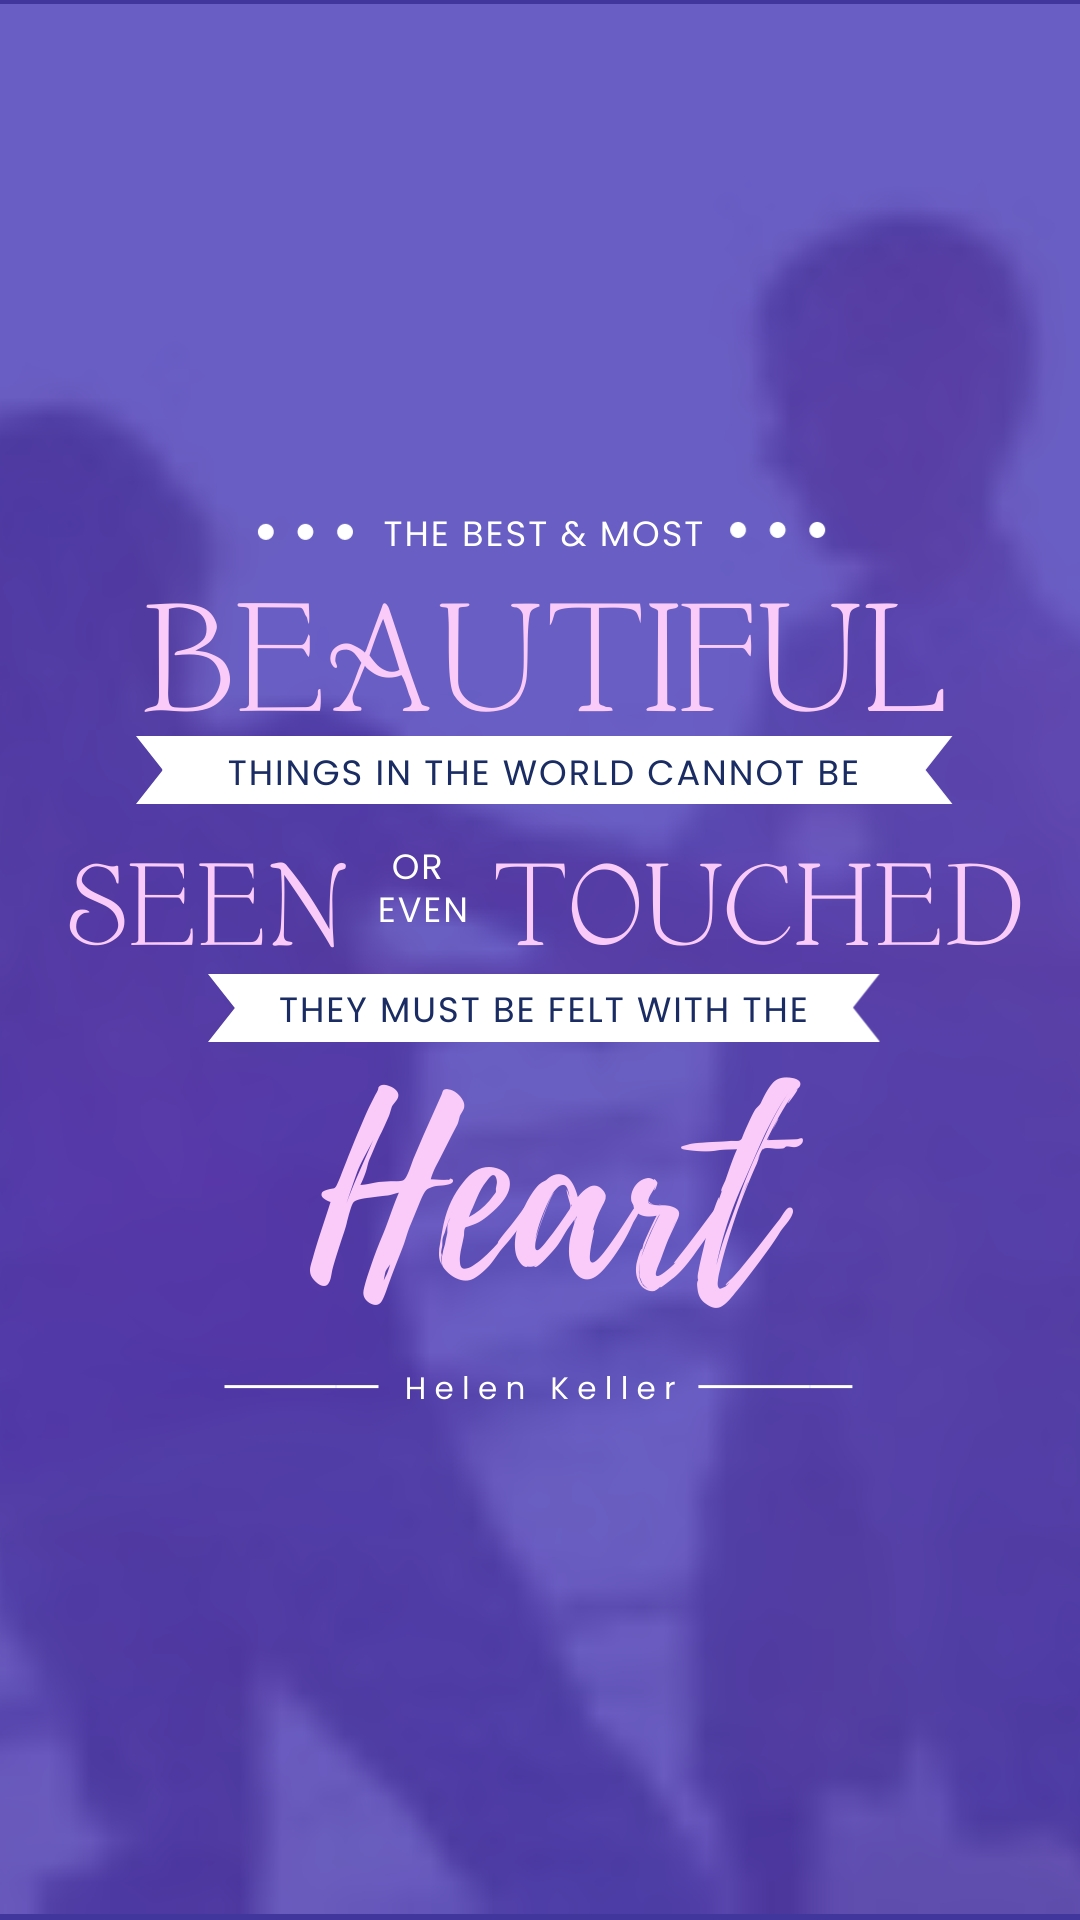 Helen Keller Animated Quote Vertical Template